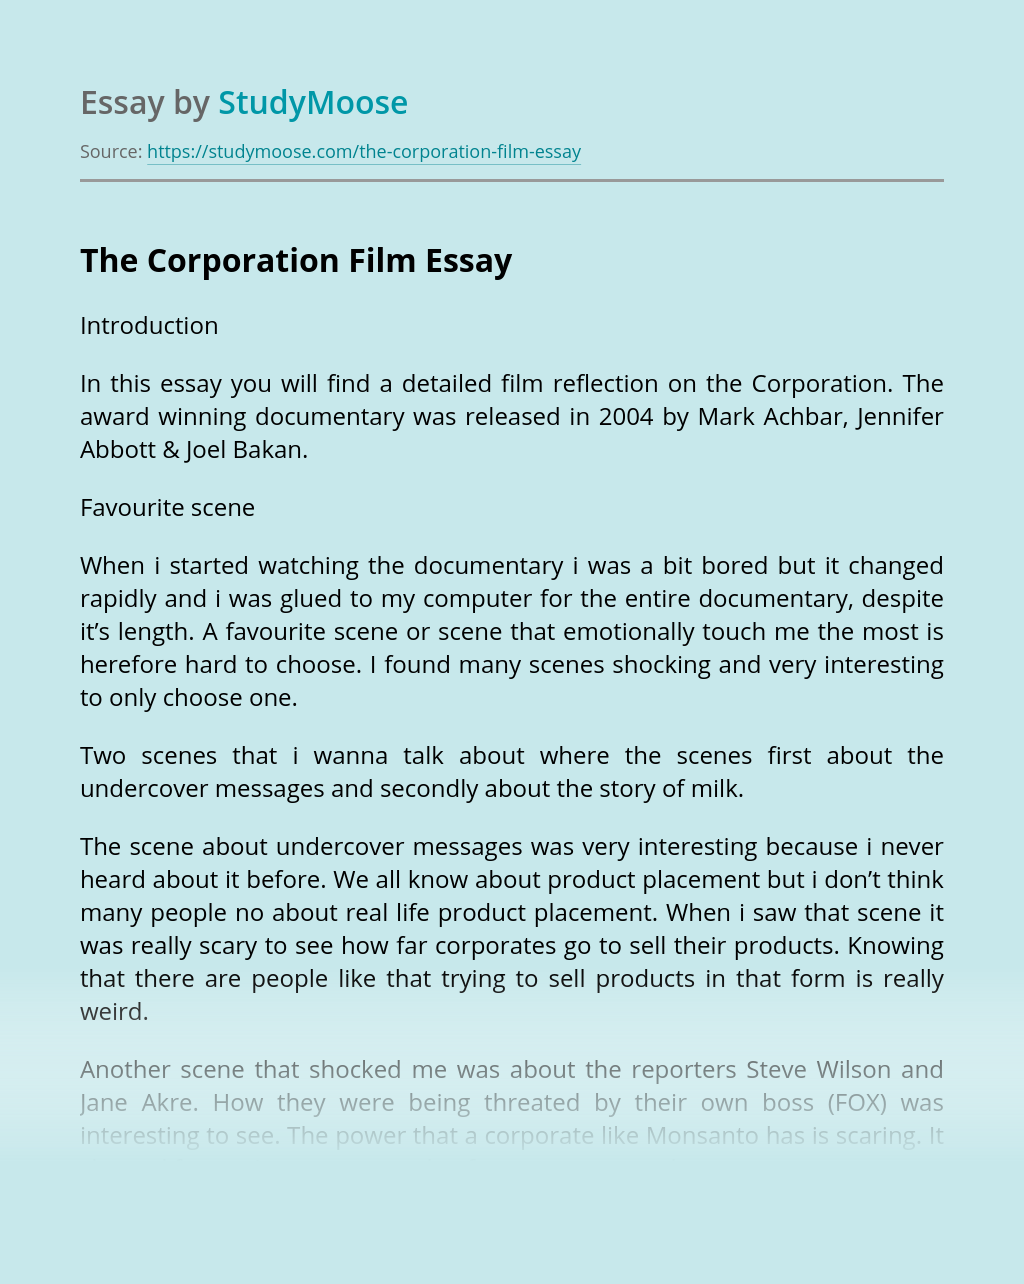 The Corporation Film